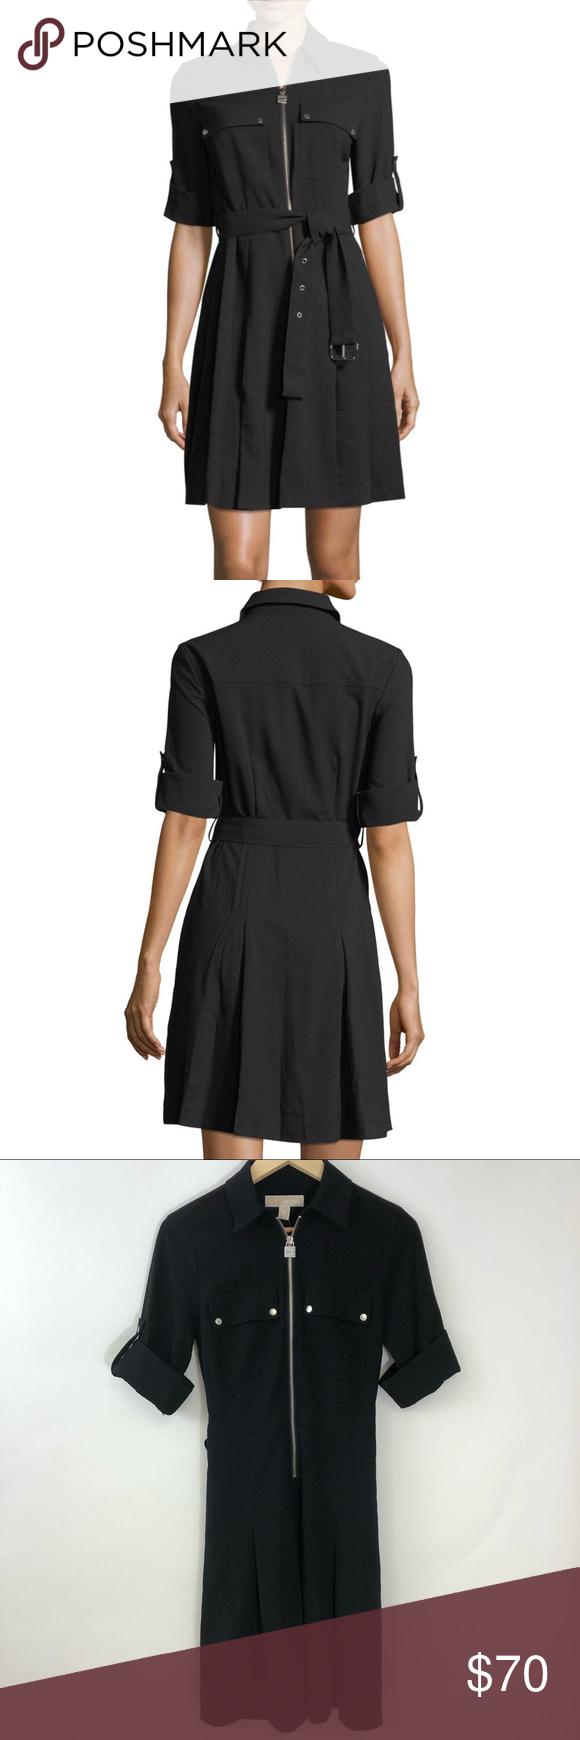 2fac991a447 NWT MICHAEL Michael Kors Shirt Dress Size XS NWT MICHAEL Michael Kors Lock- Zip Crepe